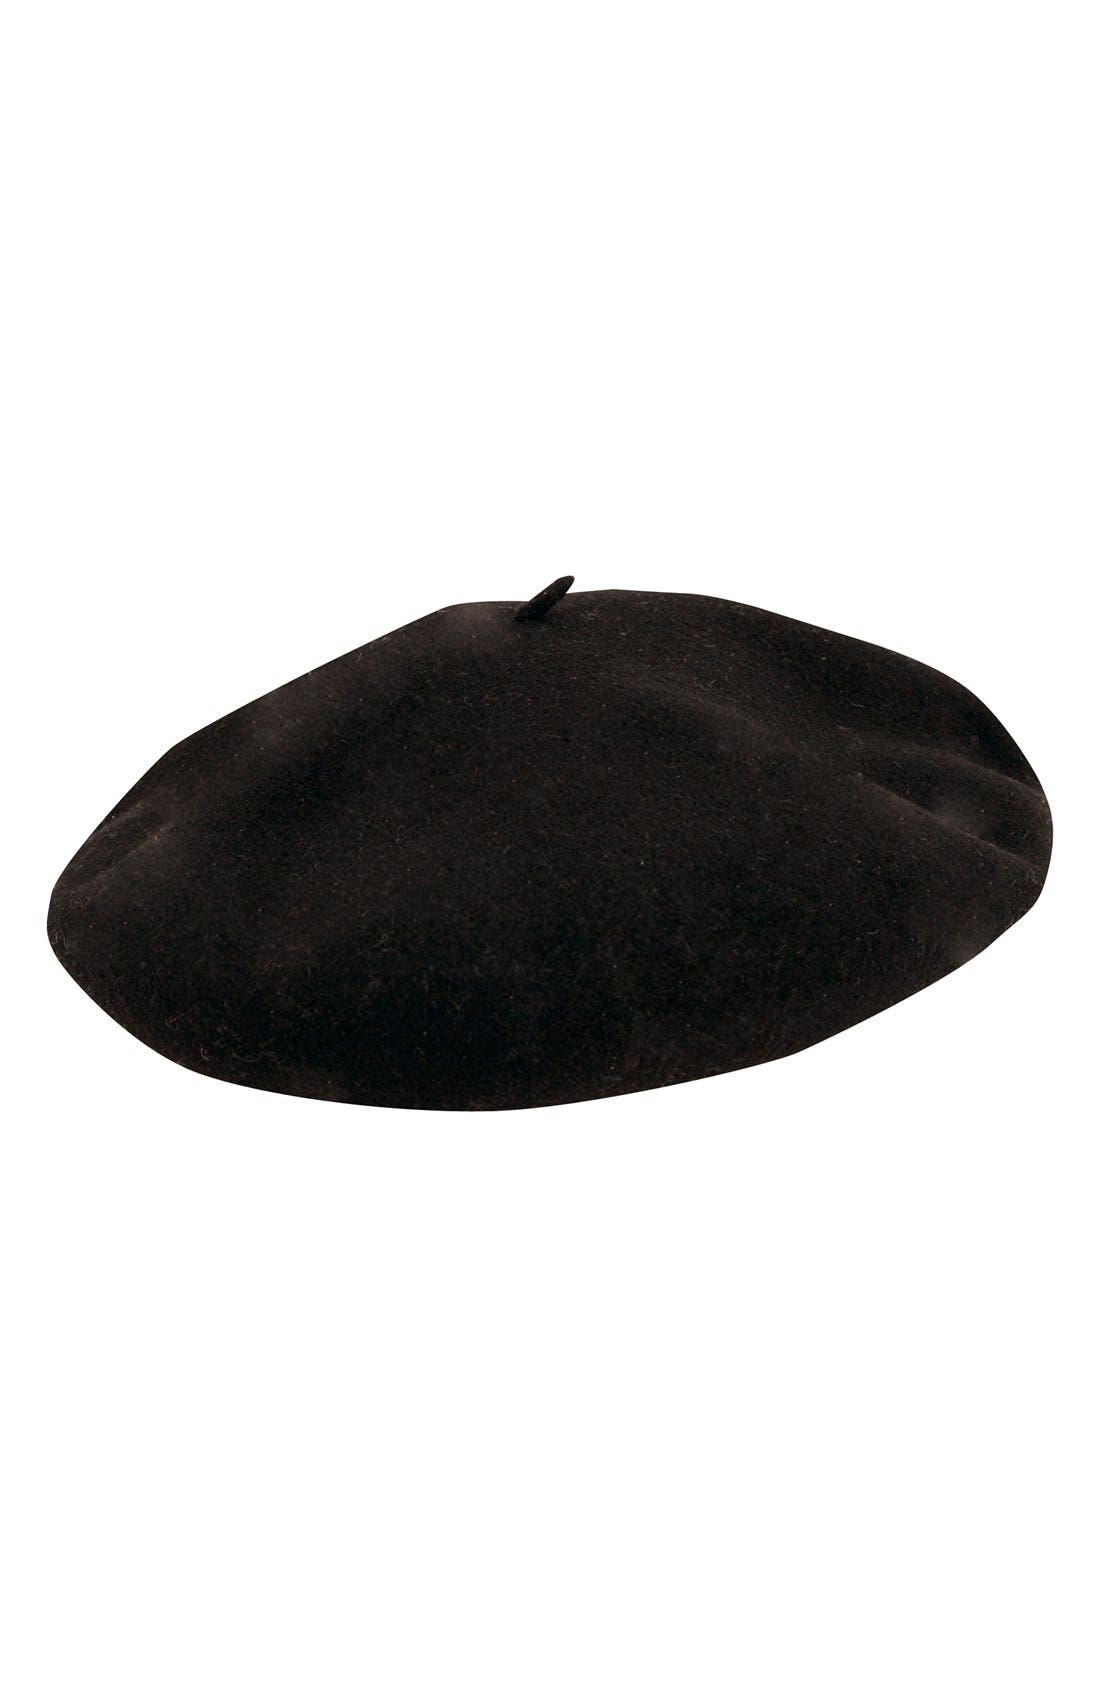 'Basque' Beret,                         Main,                         color, Black